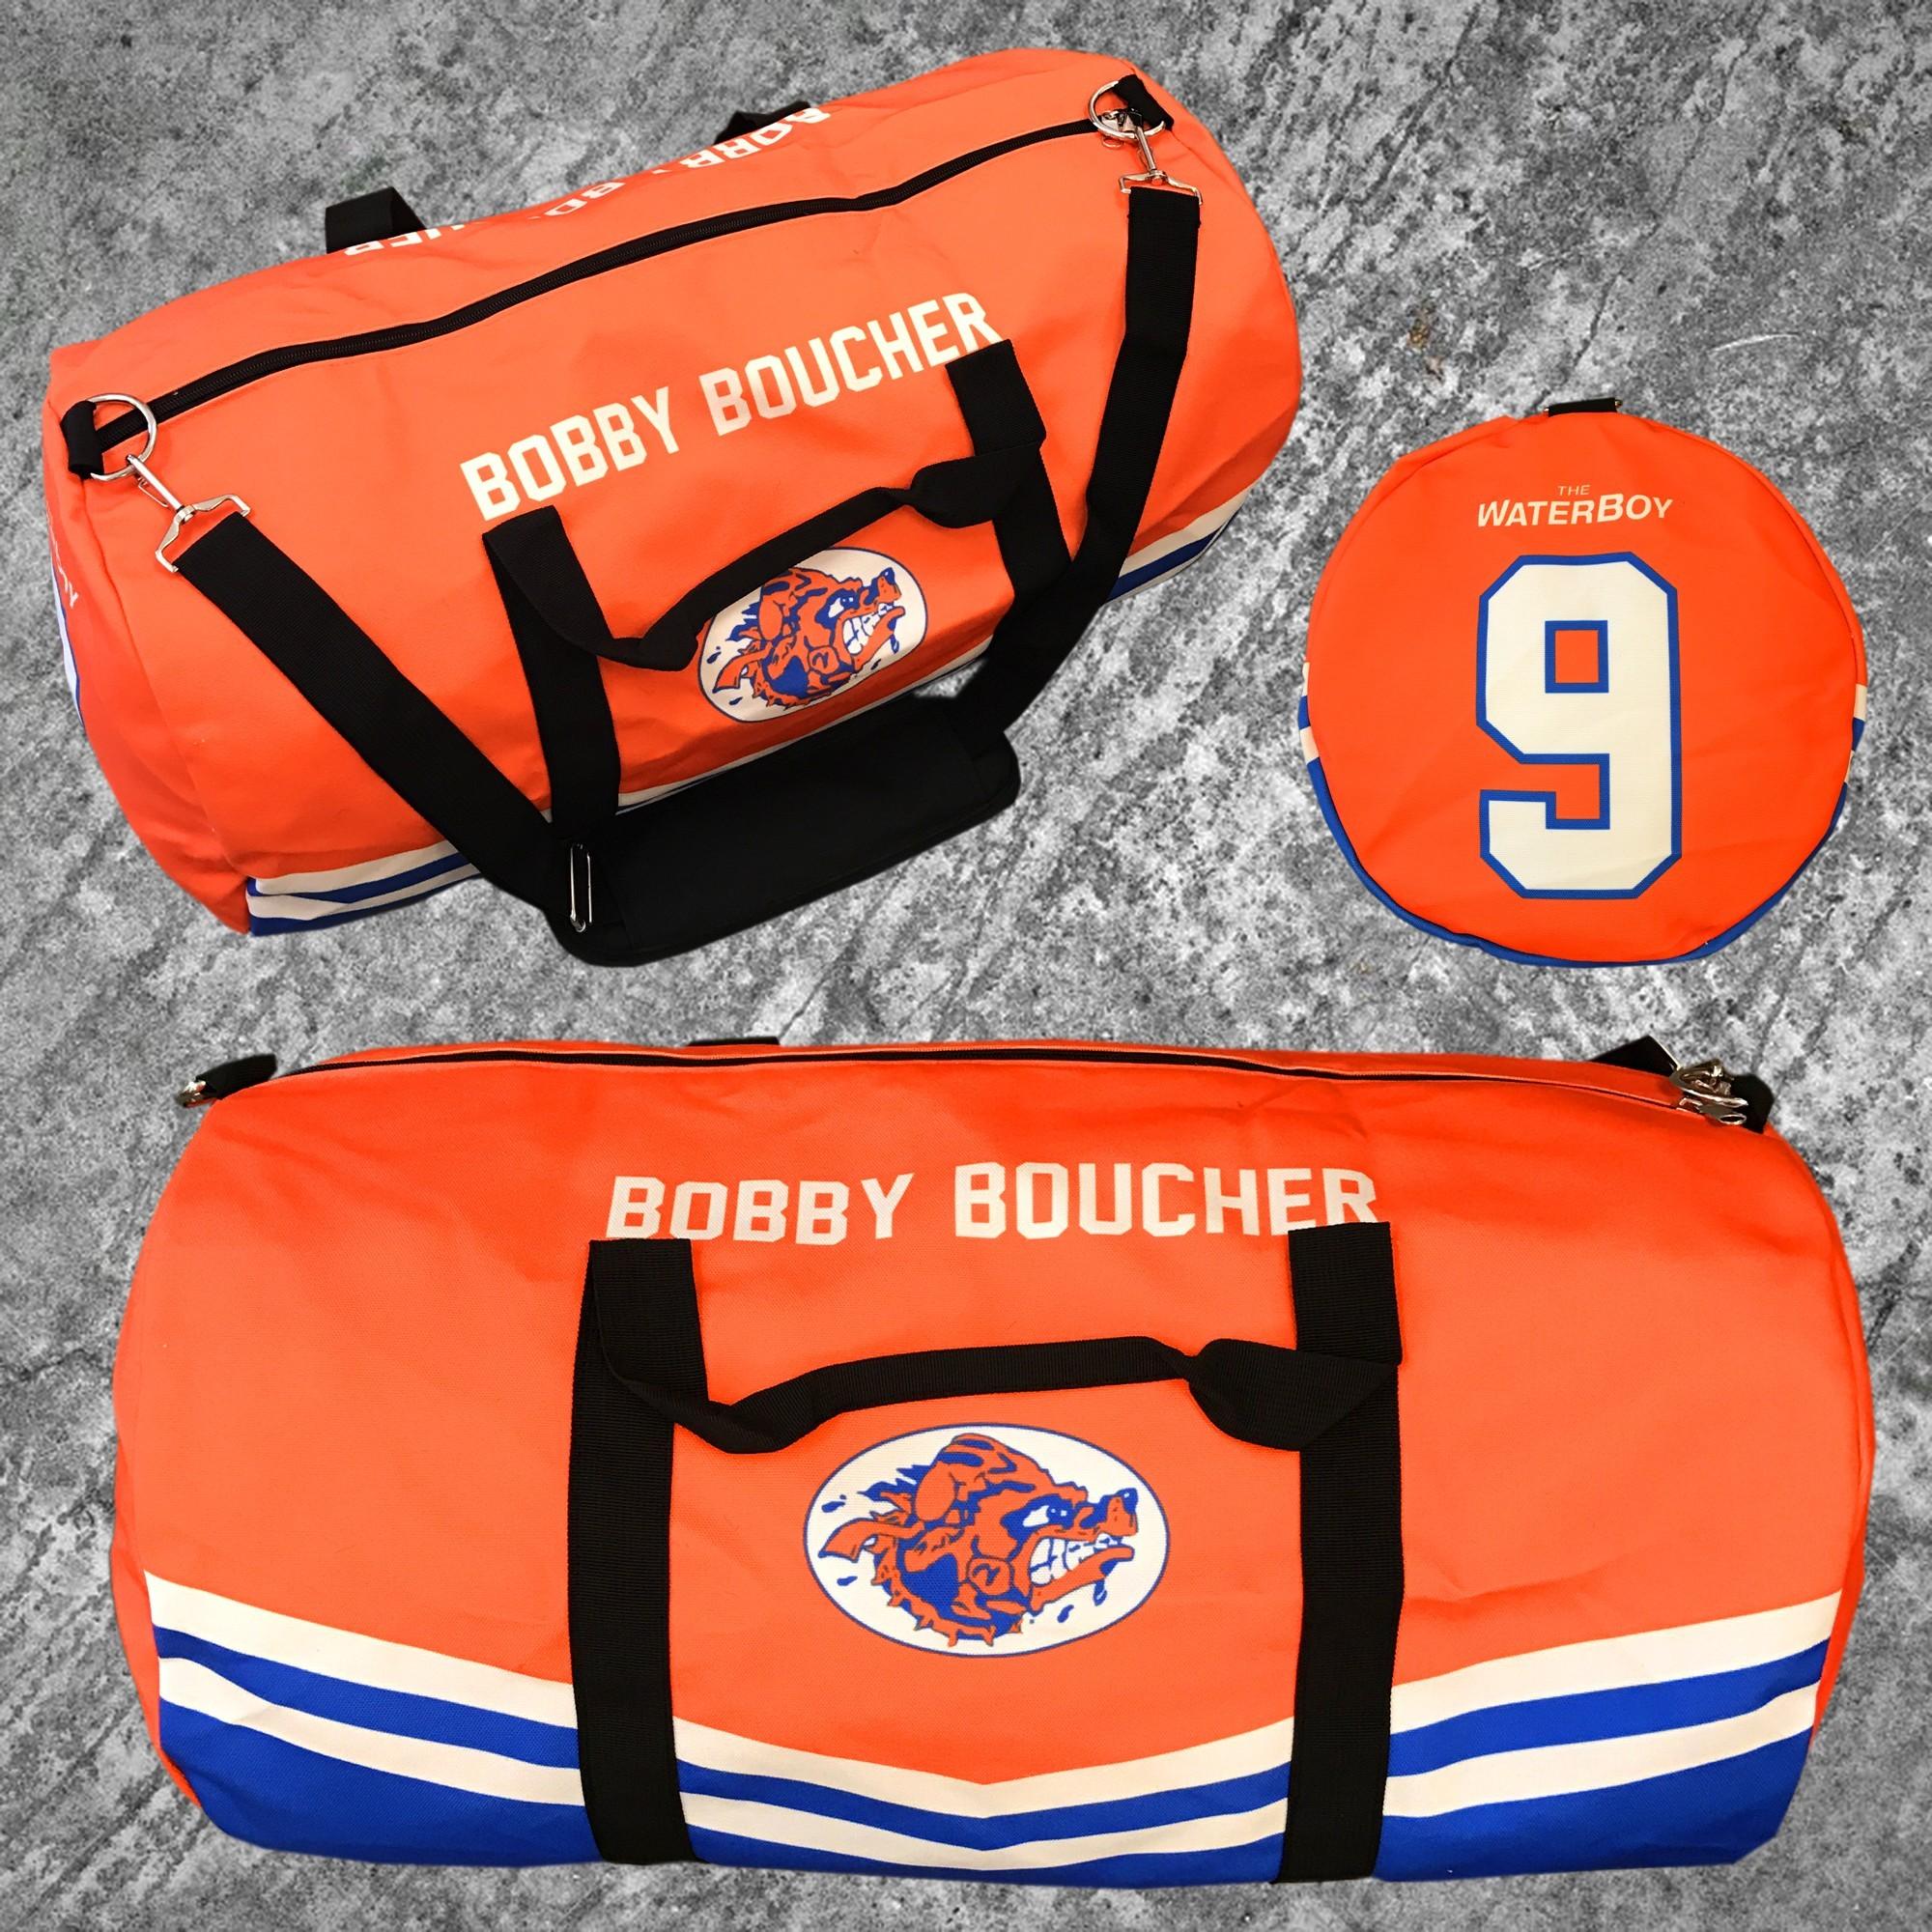 BOBBY BOUCHER WATERBOY DUFFLE BAG